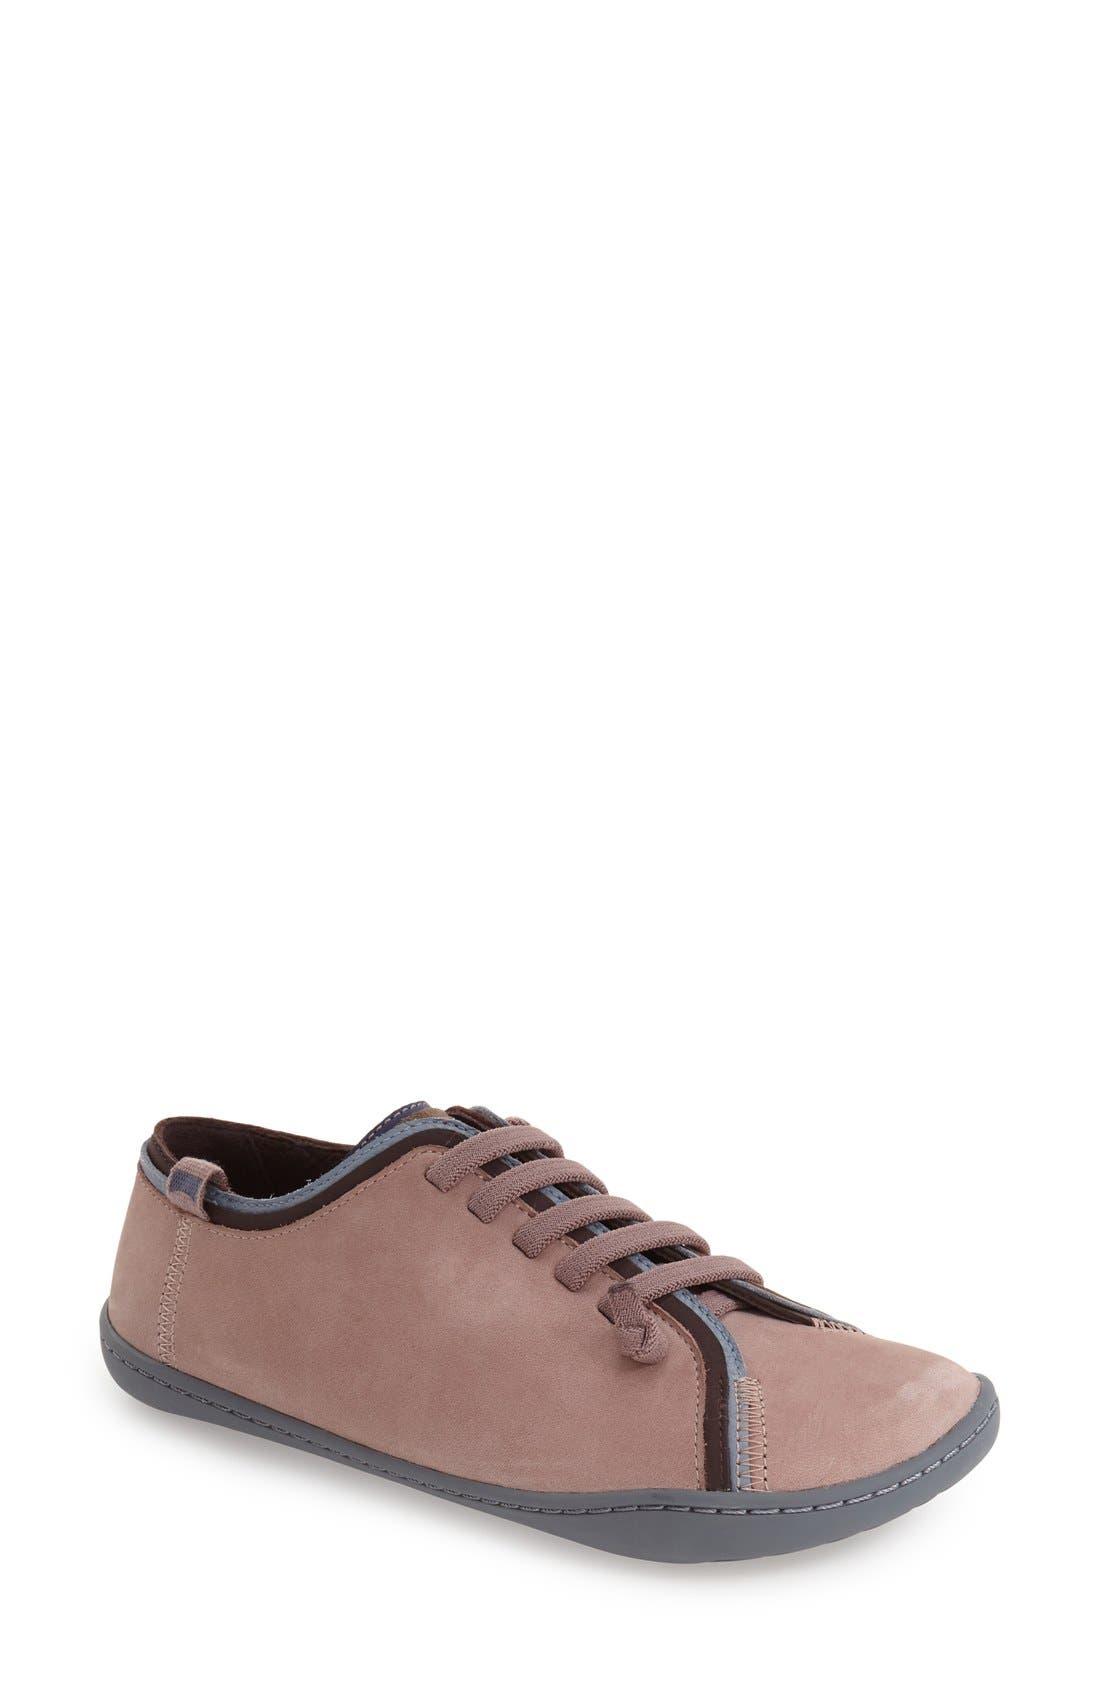 'TWS' Sneaker,                             Main thumbnail 1, color,                             530